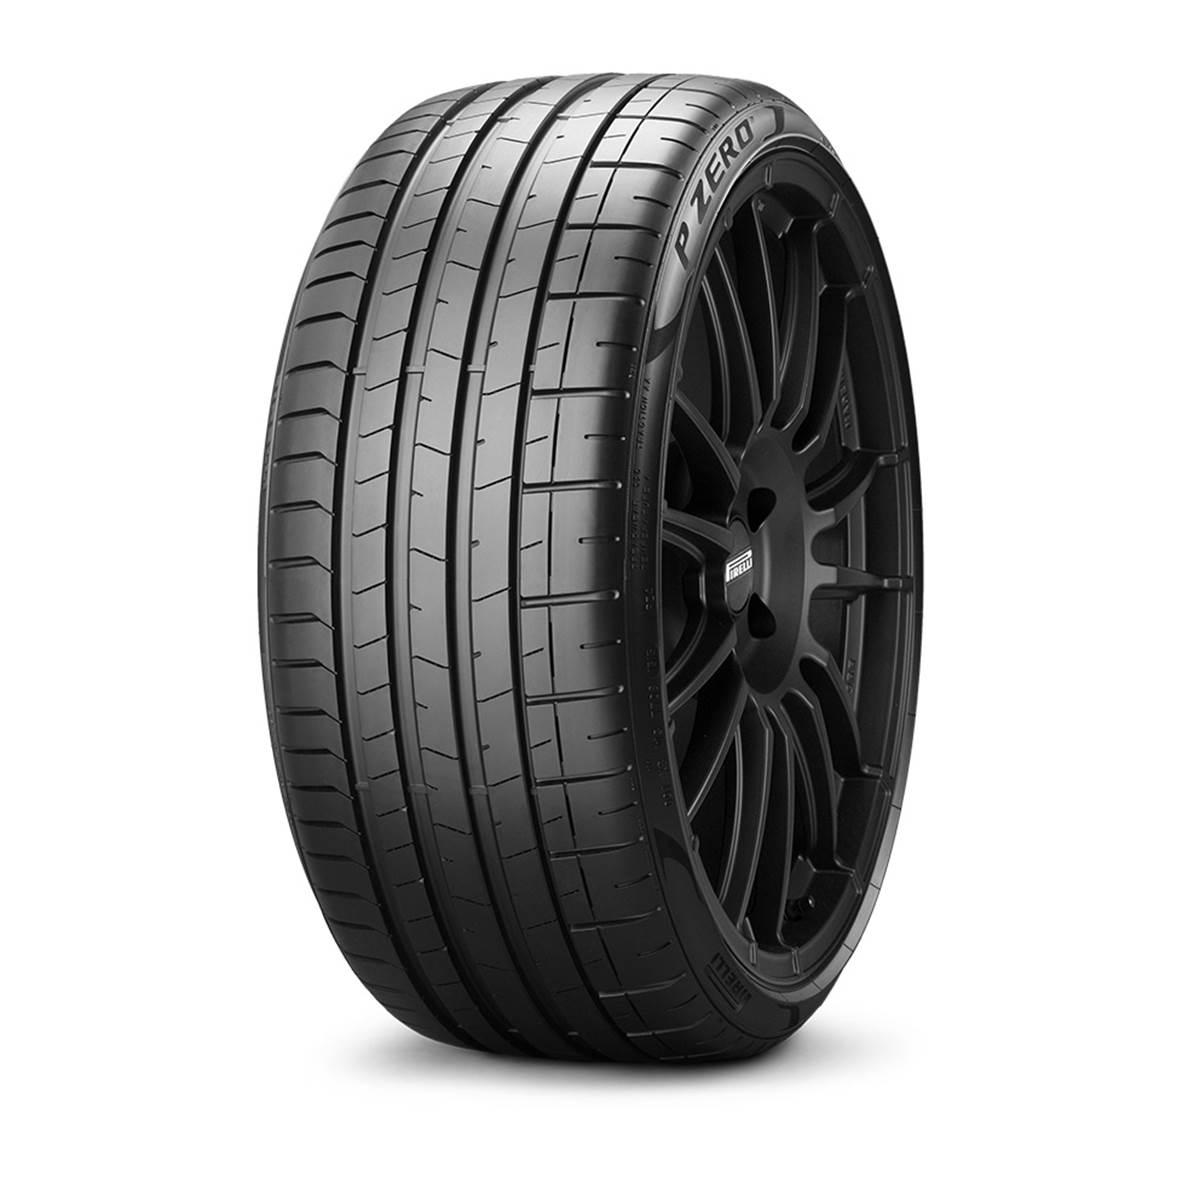 Pneu 4X4 Pirelli 255/50R20 109W Pzero XL